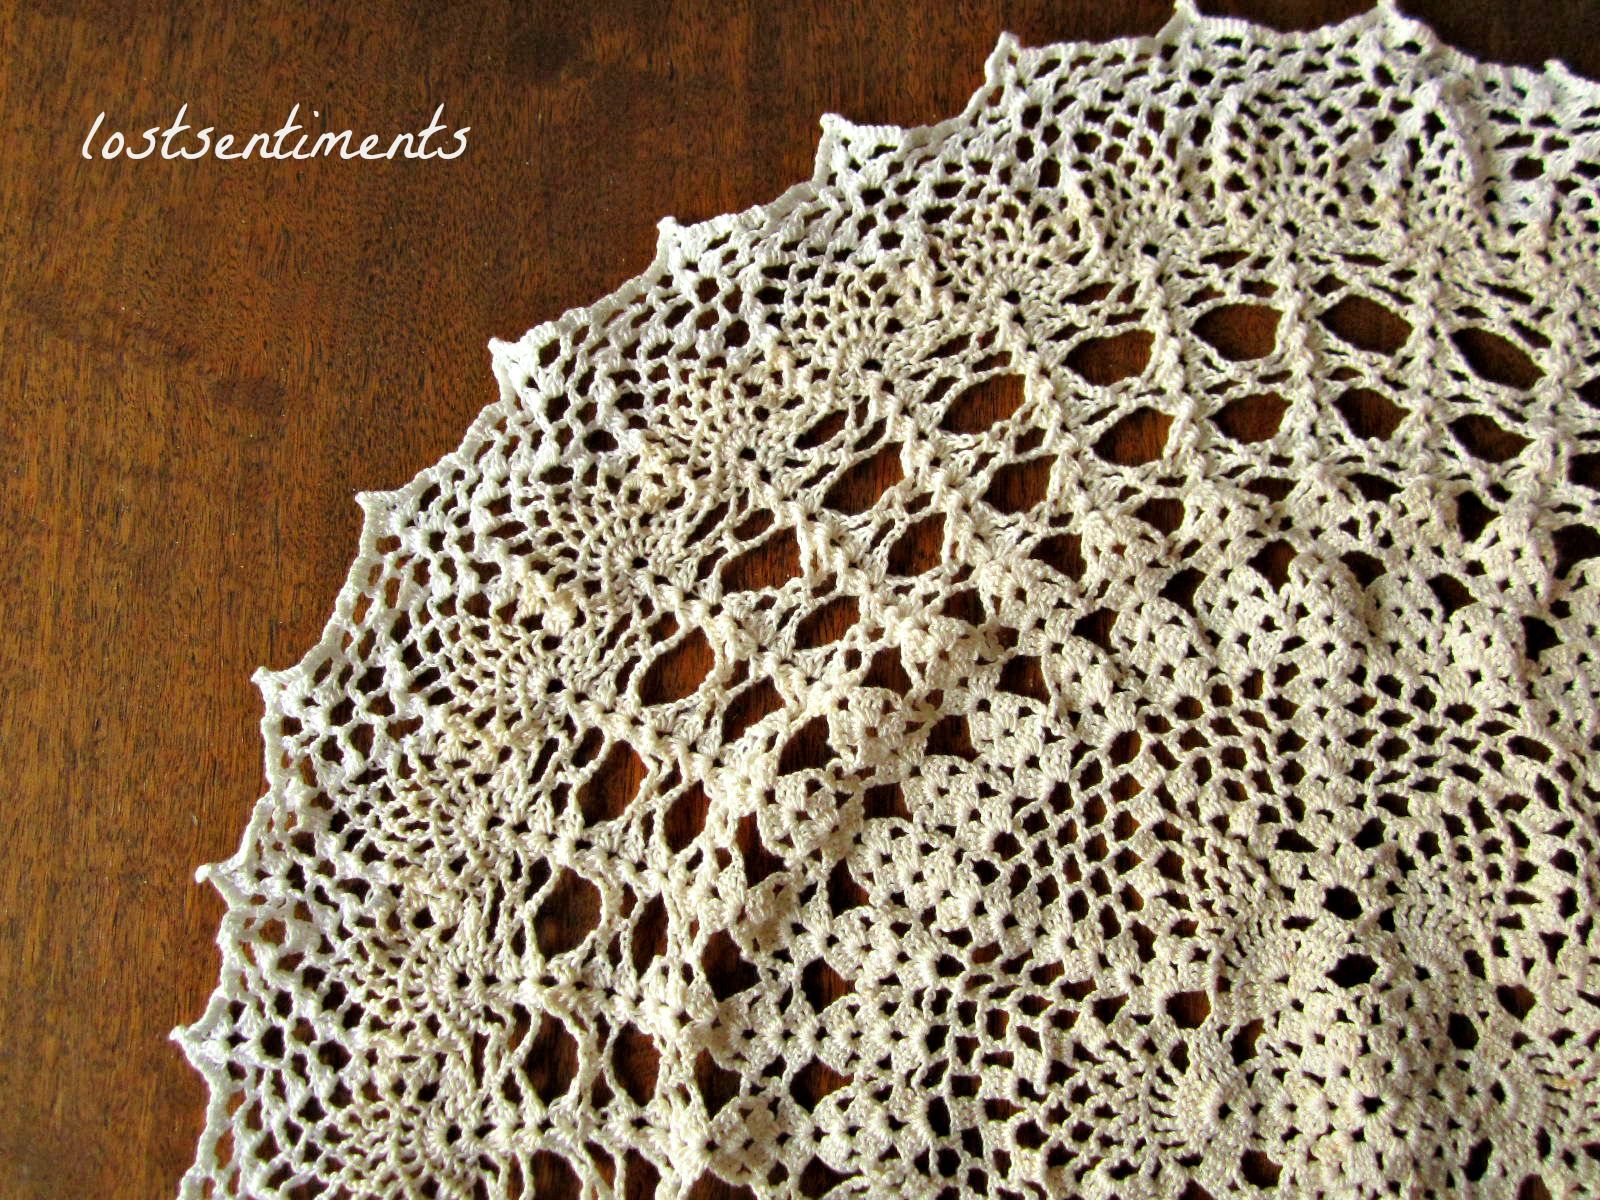 lostsentiments: Vintage Crochet Doily Pattern - Venus | Doily ...